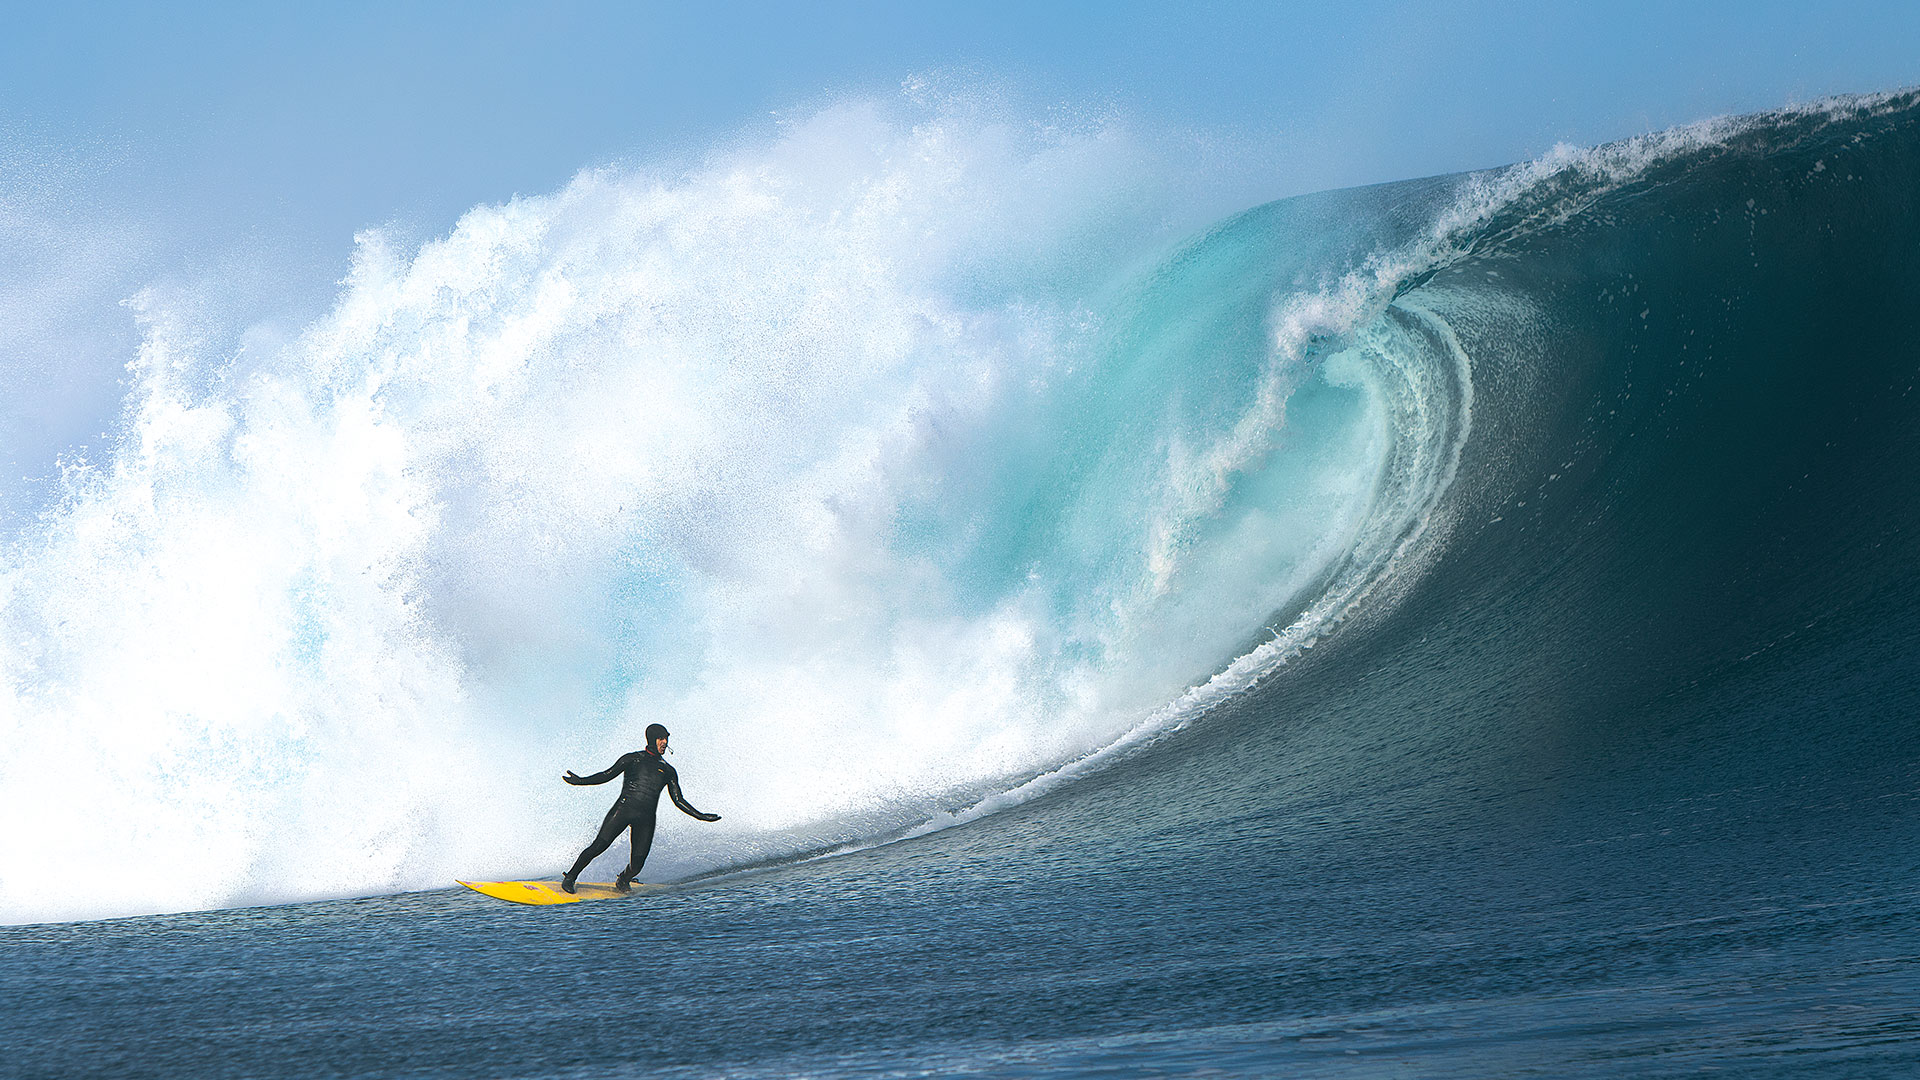 Patagonia Sports Surfing